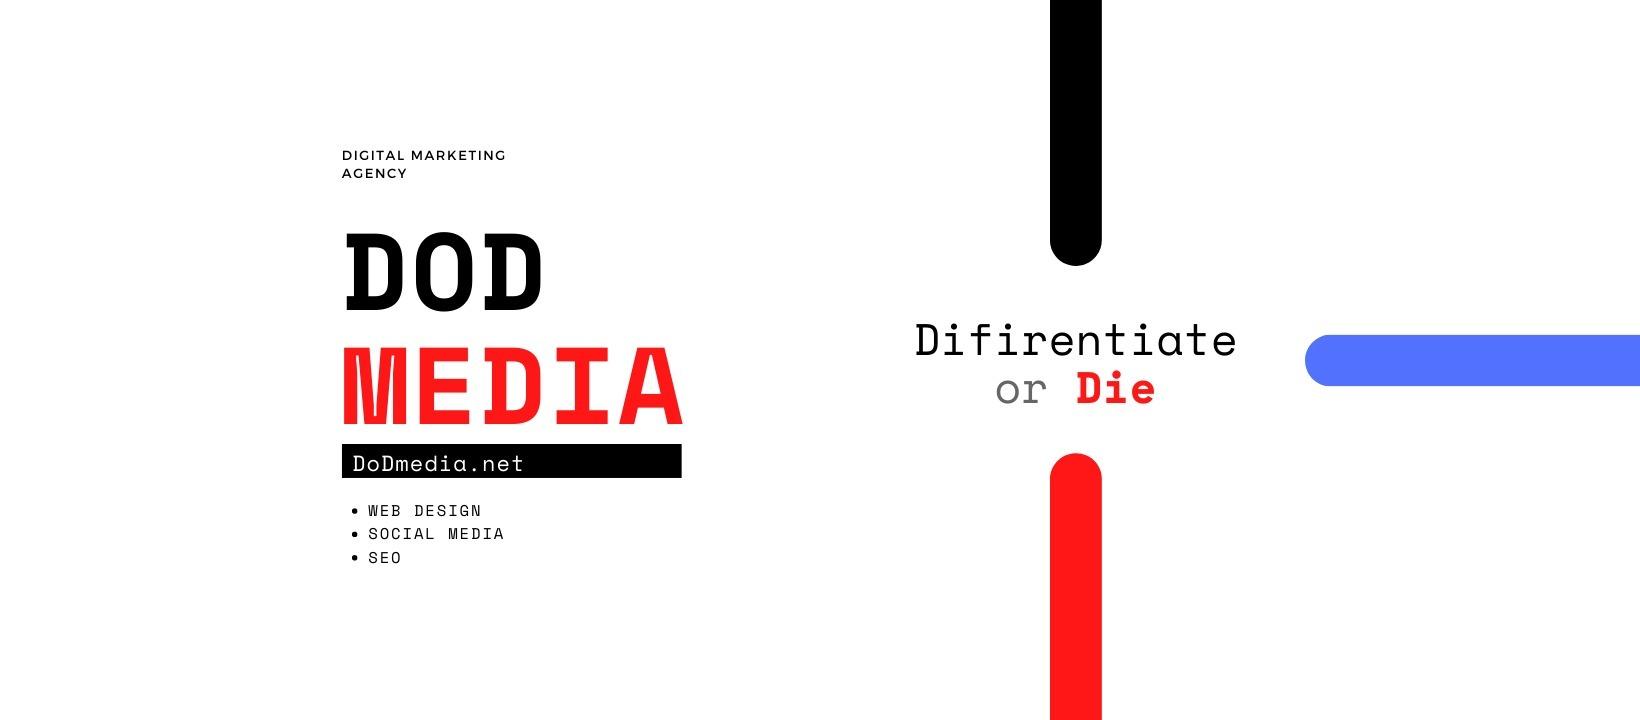 DoDmedia.net - Digital Marketing Agency Vietnam (@dodmedia) Cover Image